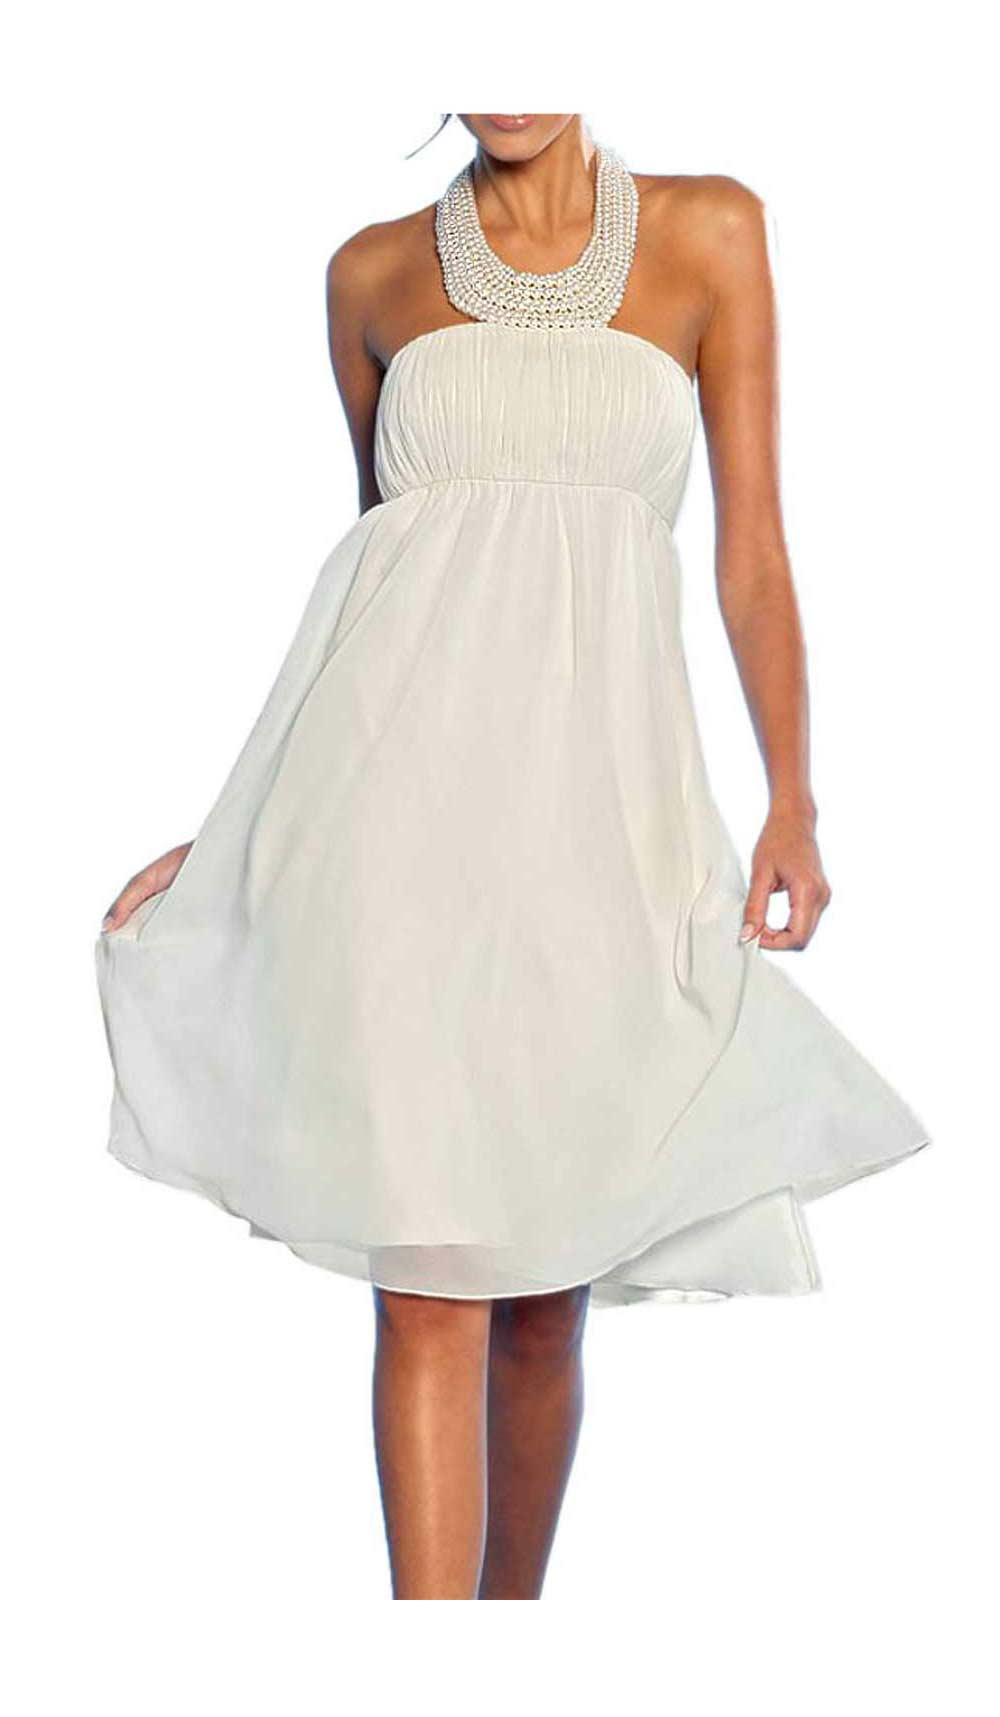 363.111 APART Damen Designer-Chiffon-Abendkleid m. Perlen Creme